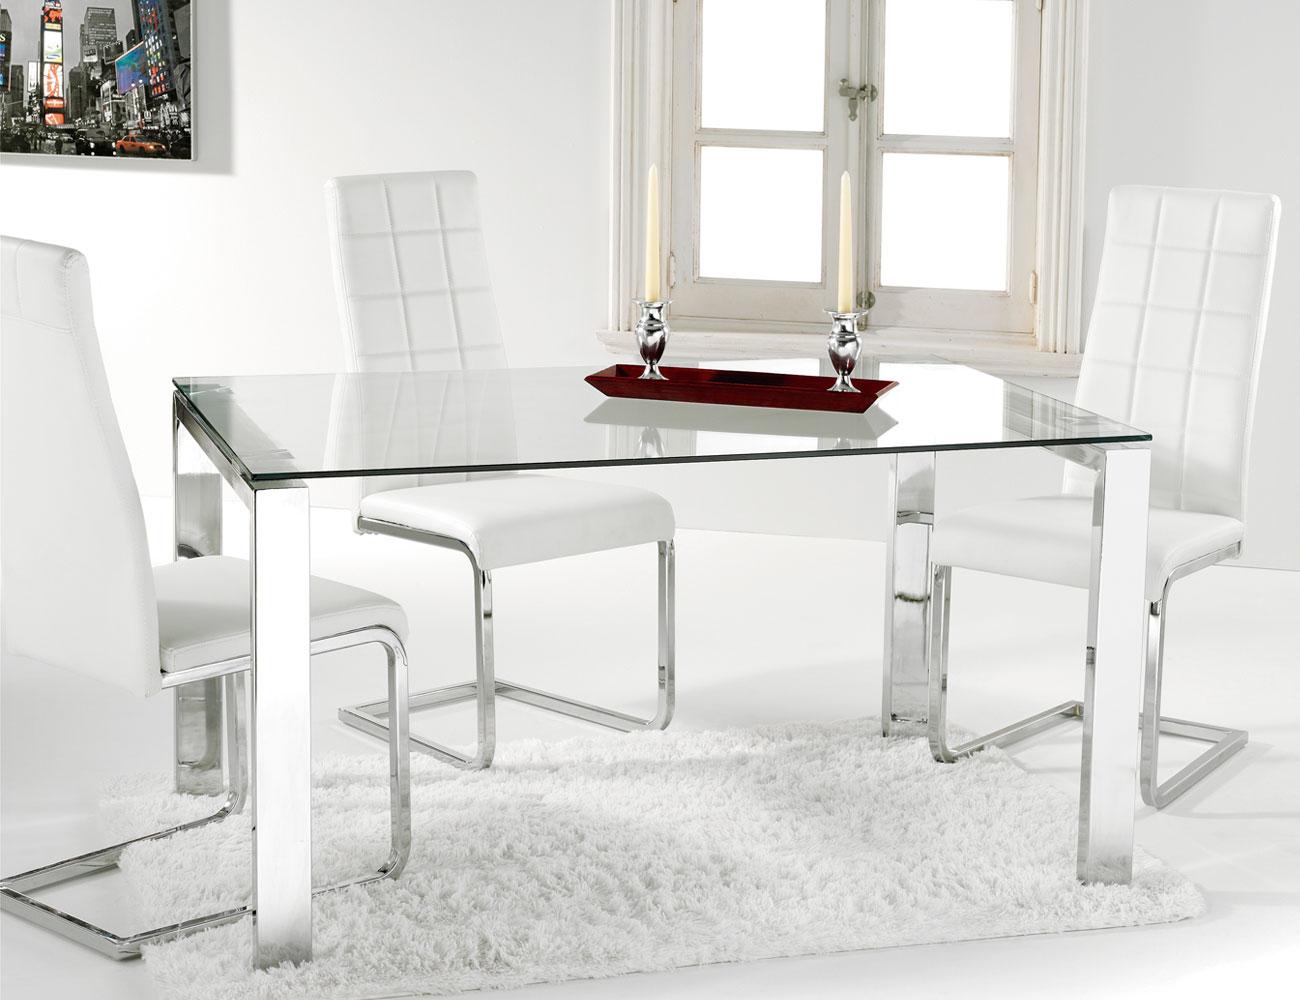 Mesa comedor cristal templado con patas cromadas factory - Mesas de comedor de cristal ...